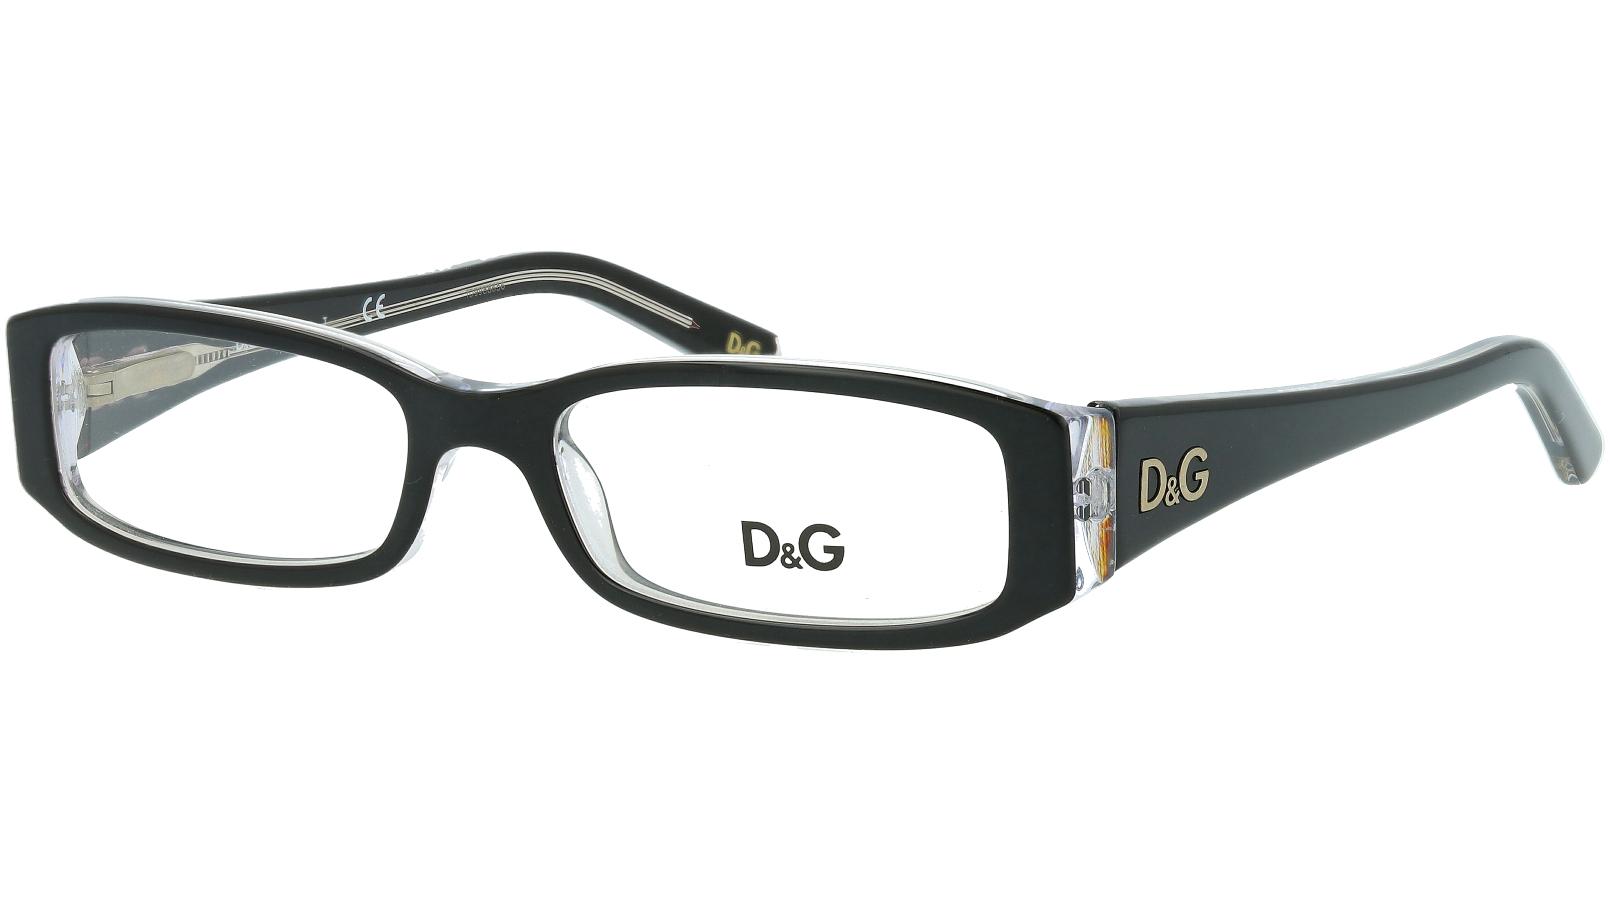 Dolce&Gabbana DG1179 675 51 BLACK Glasses